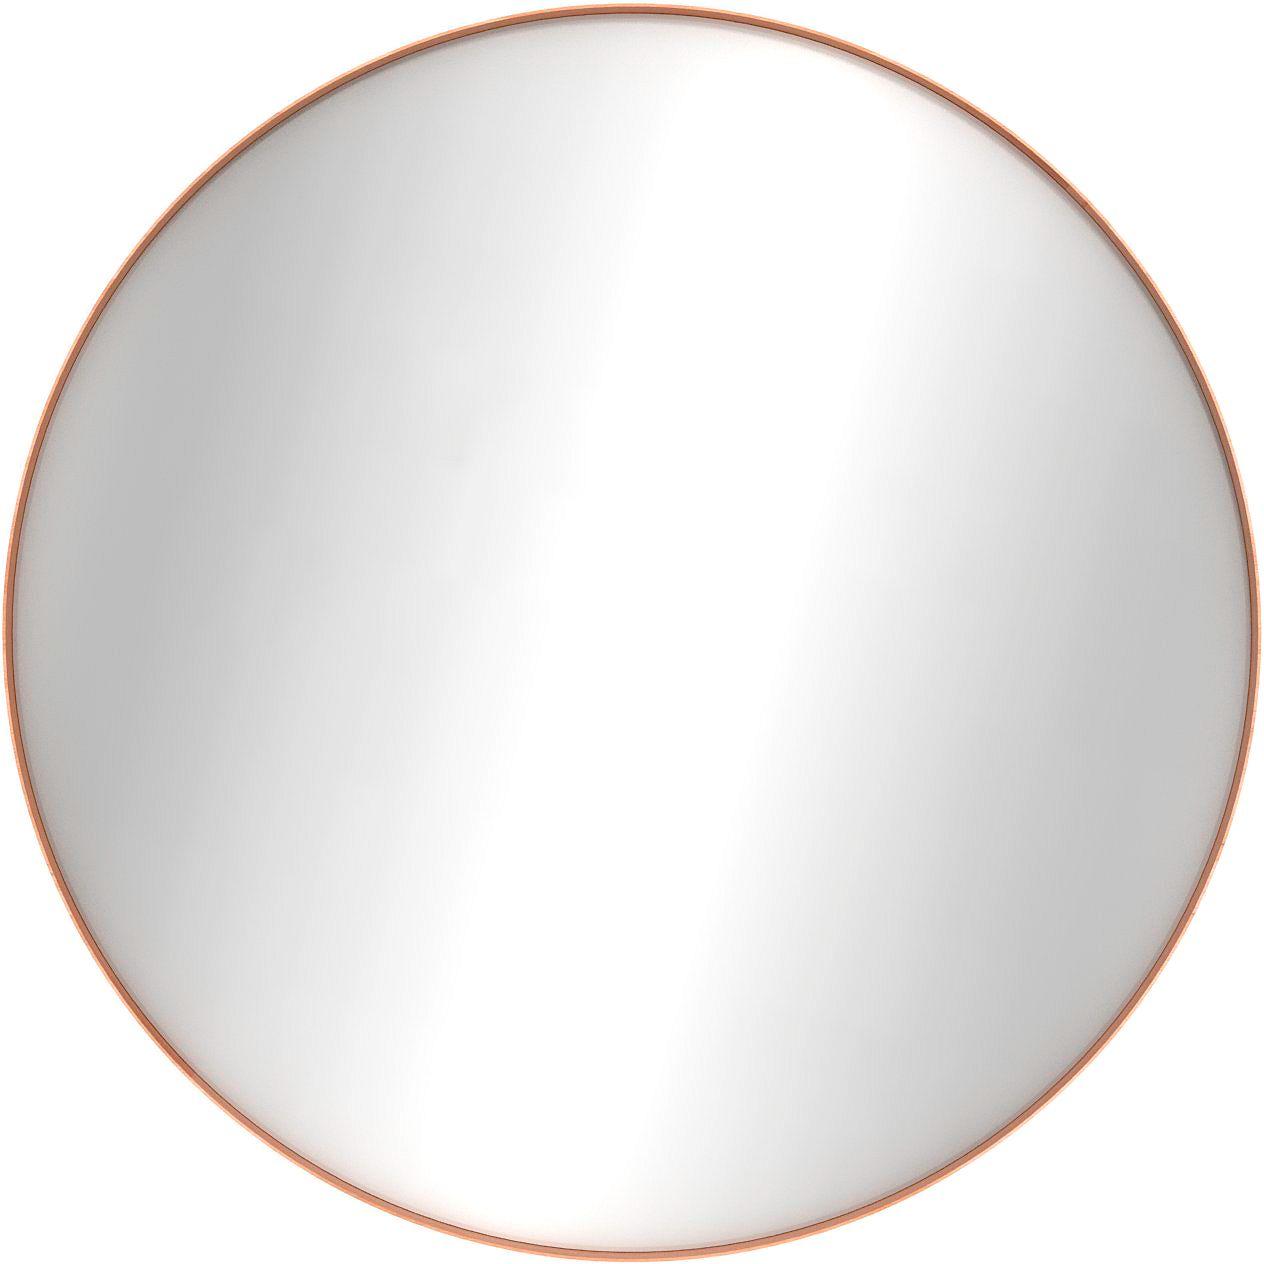 Miroir Rond Chene Ethnicraft 90cm